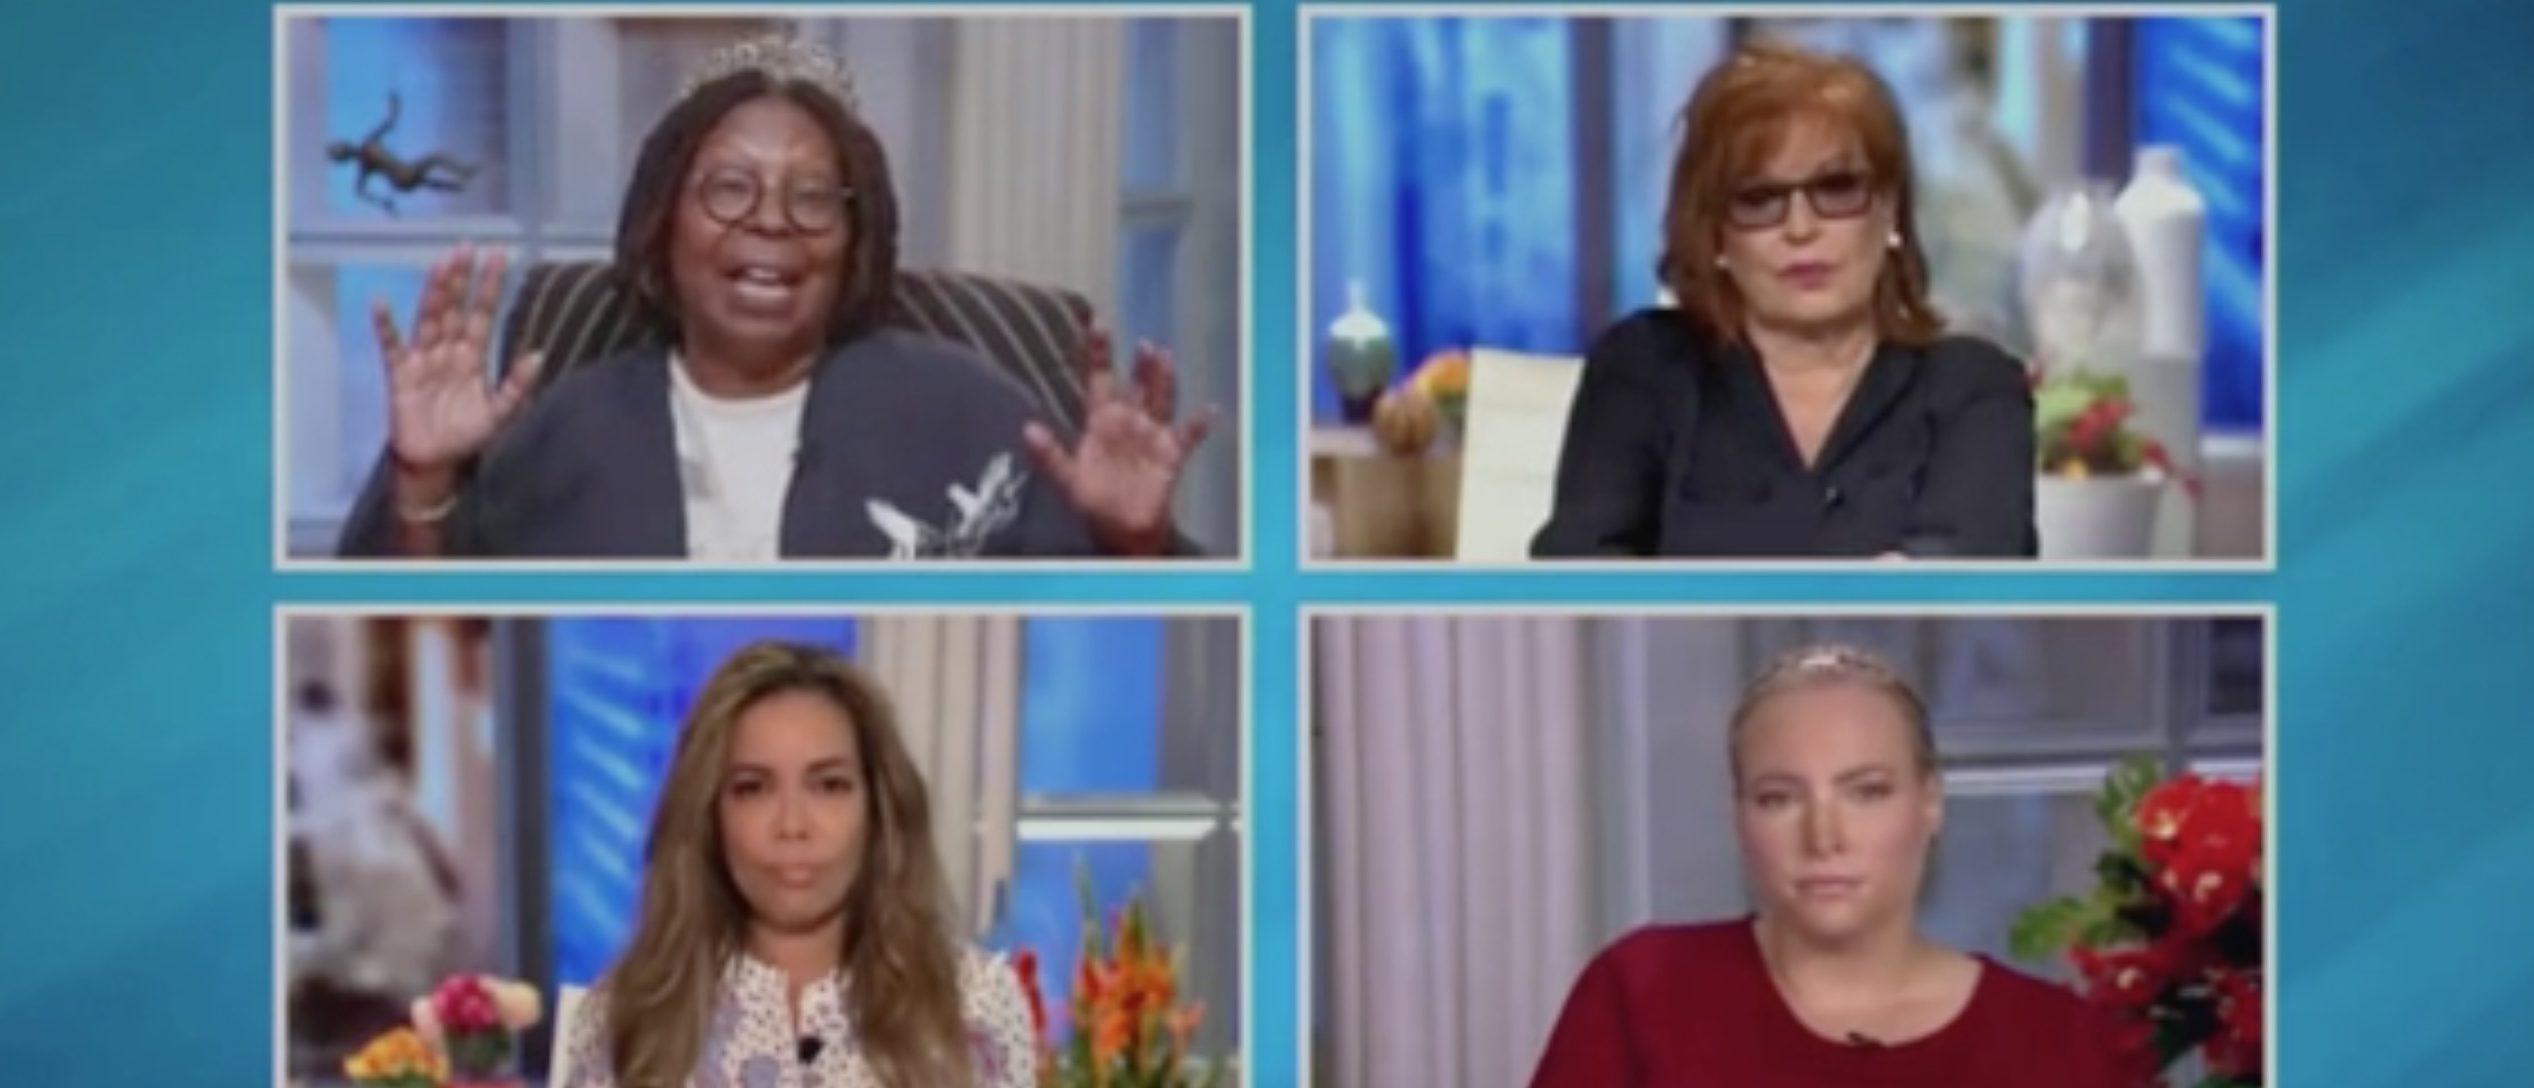 Whoopi Goldberg Demands Tucker Carlson Apologize For Calling Tammy Duckworth A 'Coward'